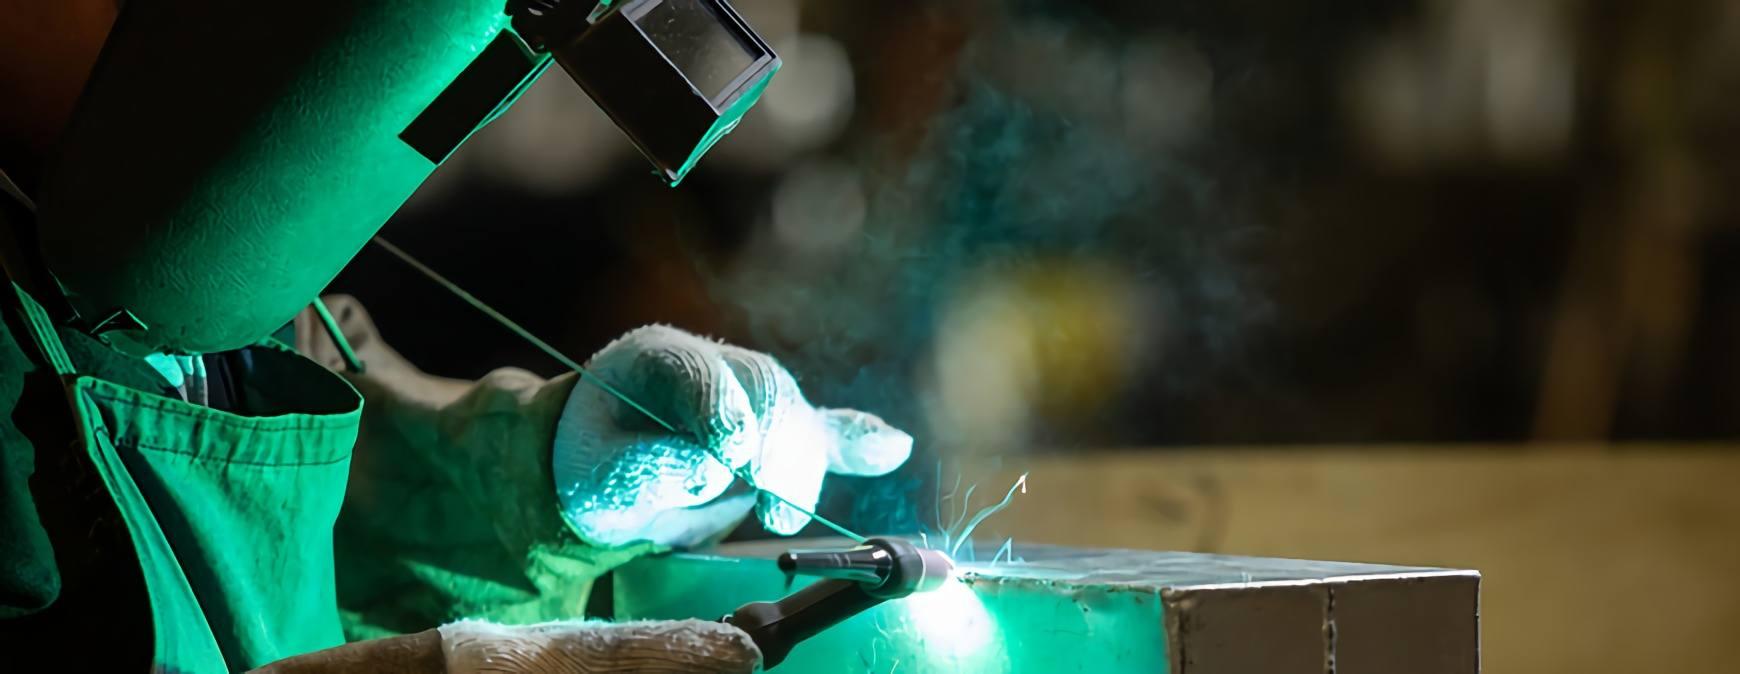 tig welder on beginner project